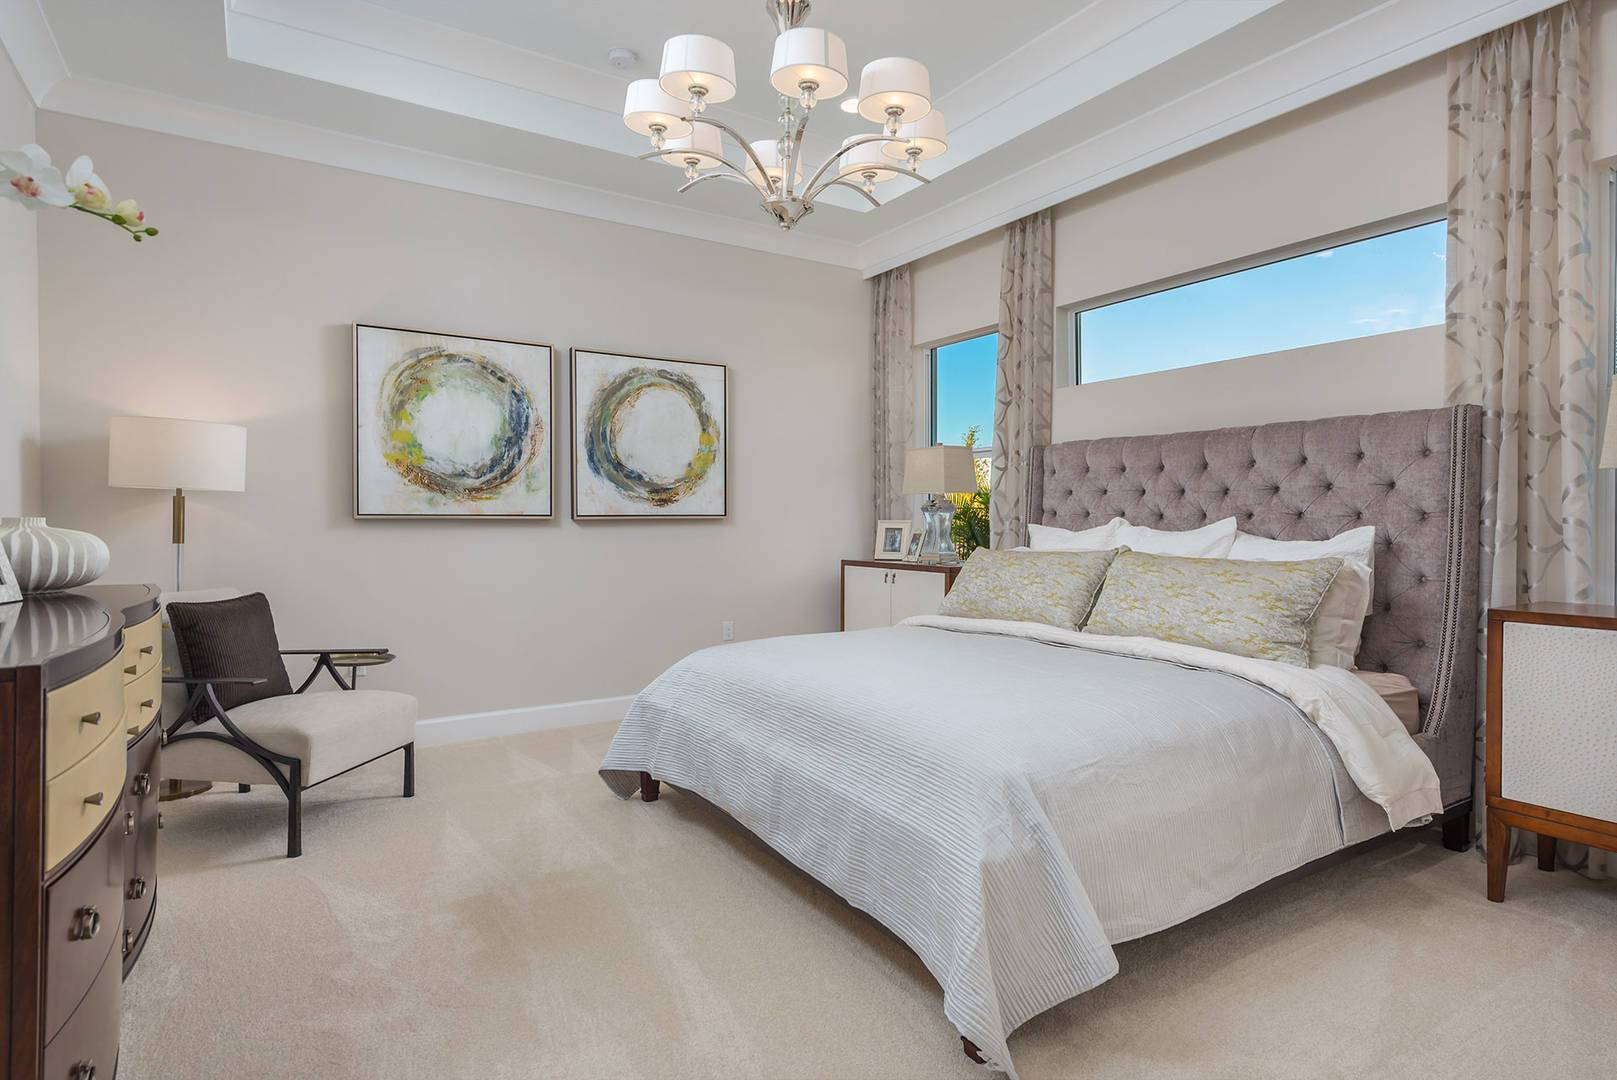 Bedroom featured in the Sierra By GL Homes in Tampa-St. Petersburg, FL